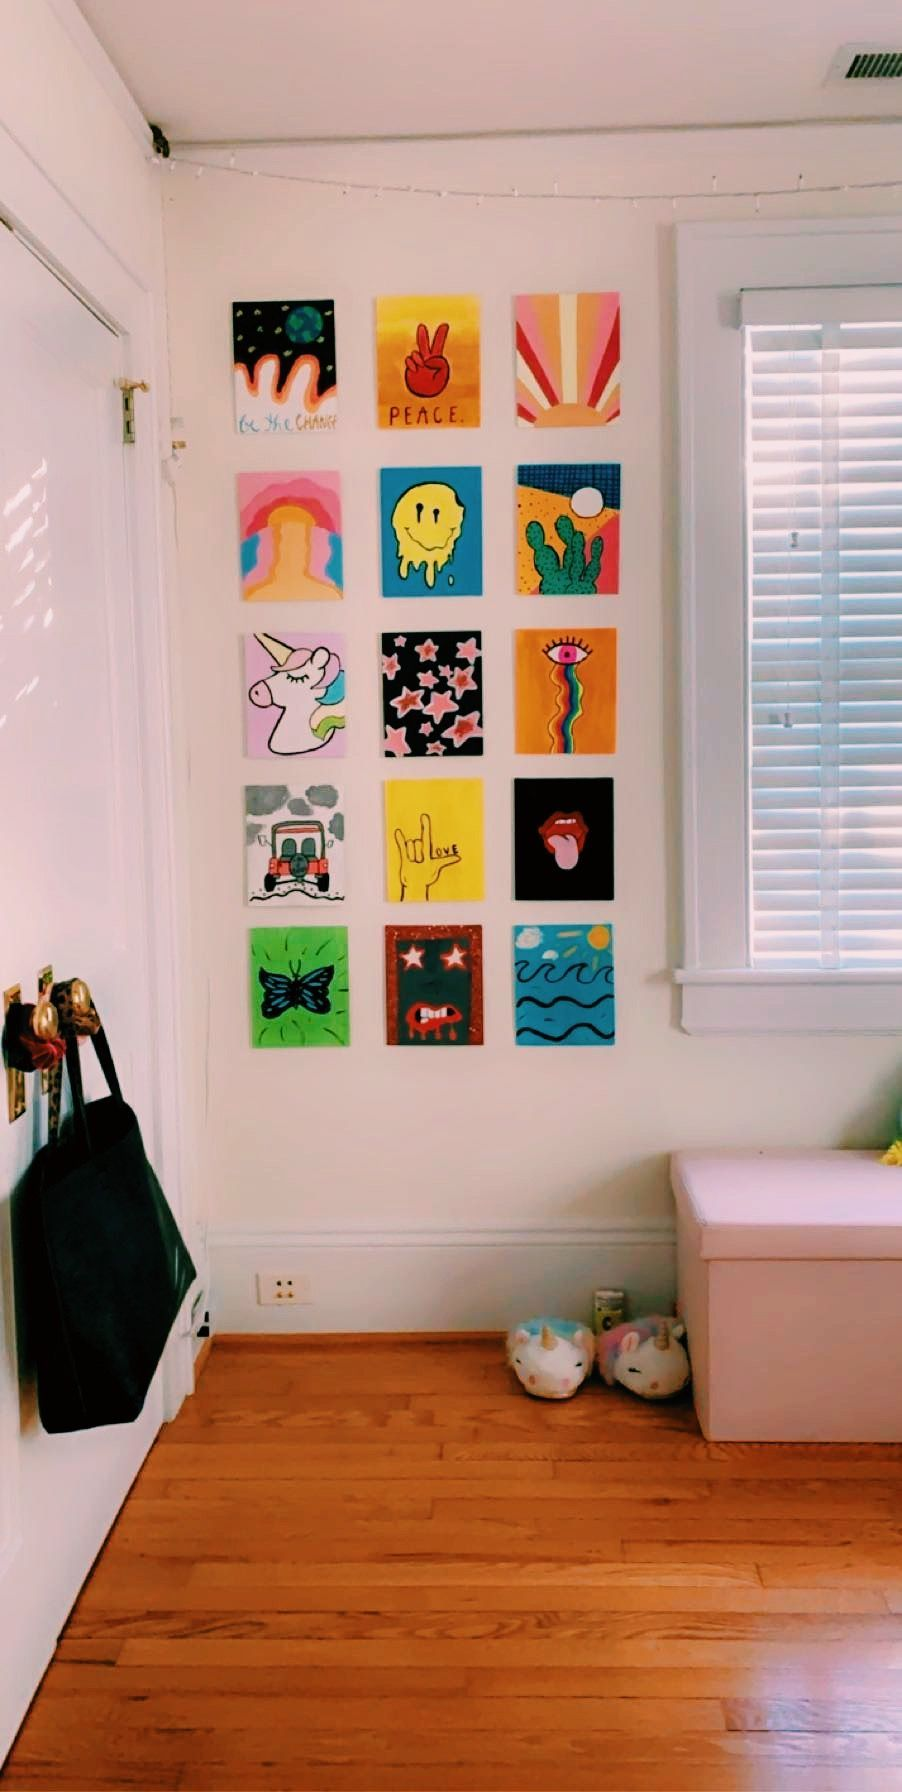 Wand Streichen In 2020 Diy Art Painting Diy Canvas Art Aesthetic Room Decor